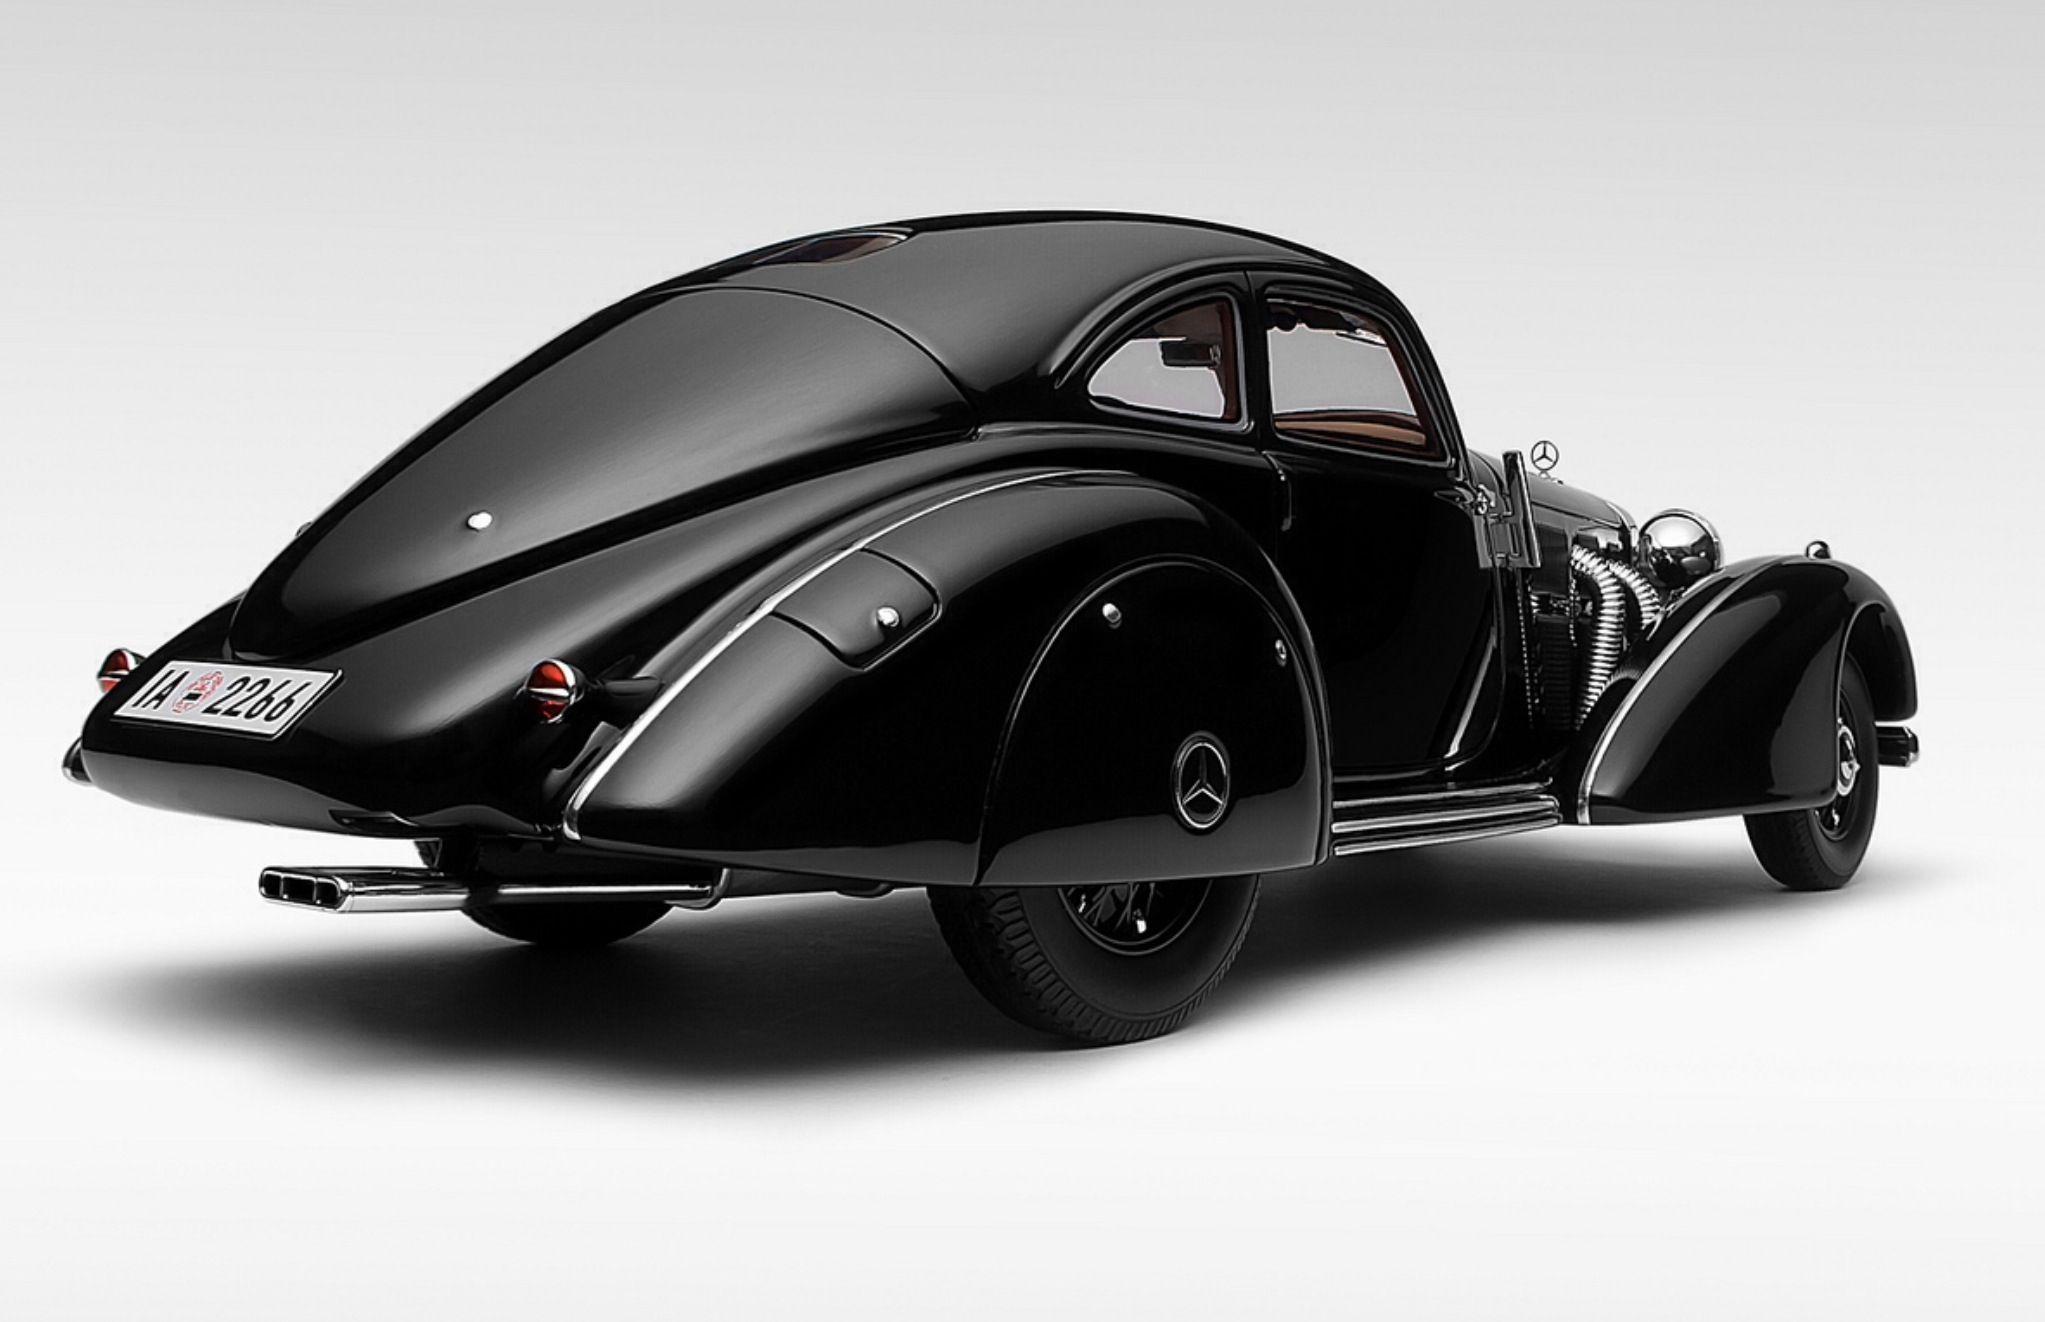 1934 mercedes benz 540k autobahn kuner coupe 39 30s coupes for Mercedes benz autobahn